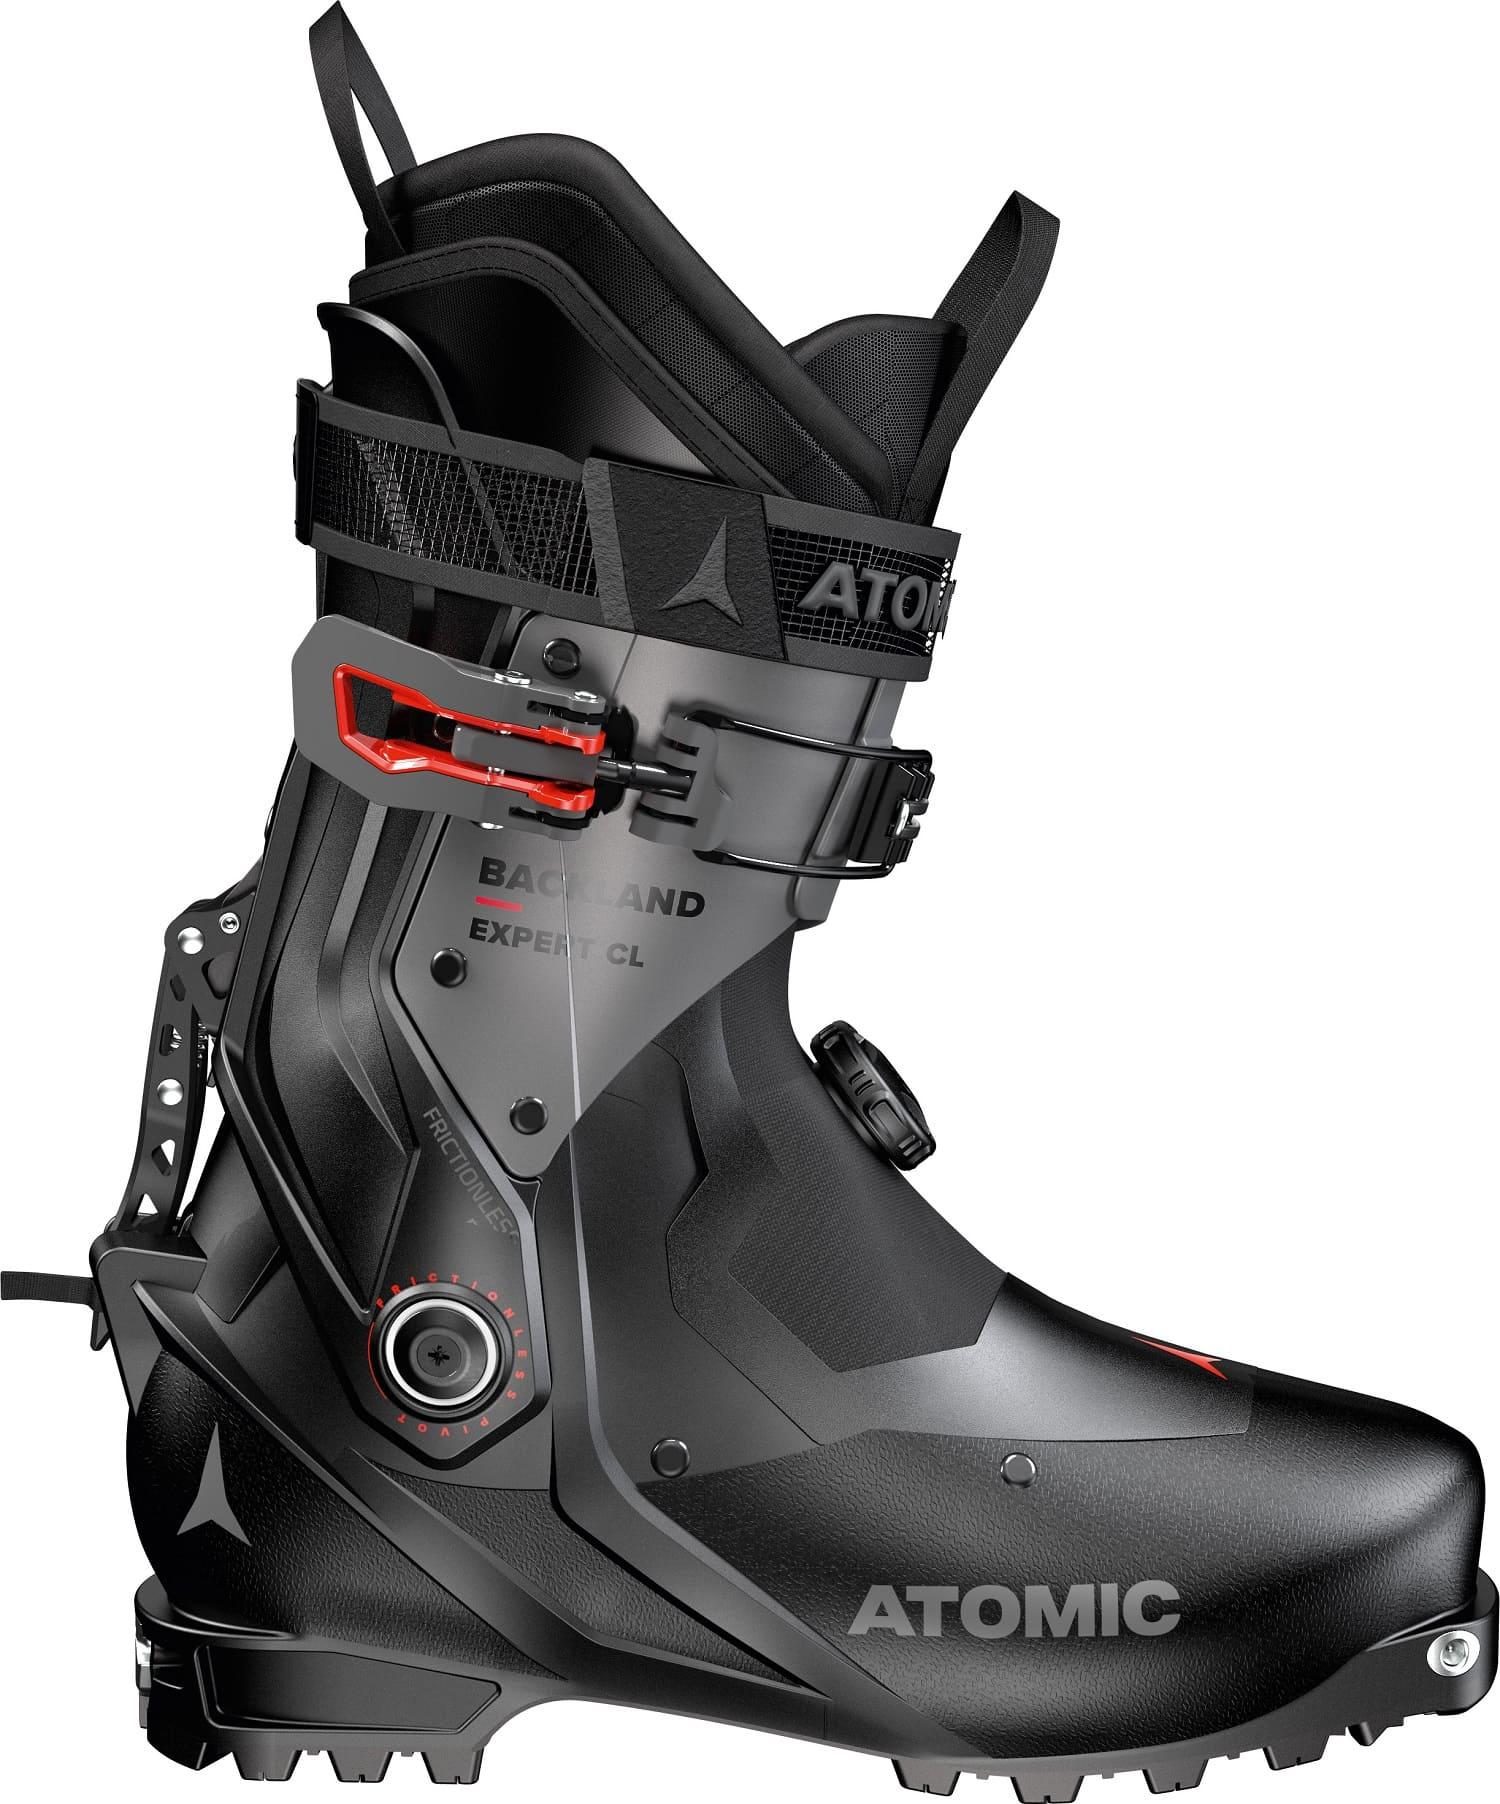 ATOMIC BACKLAND EXPERT CL HERREN Black/Anthracite/Red - 29/29.5